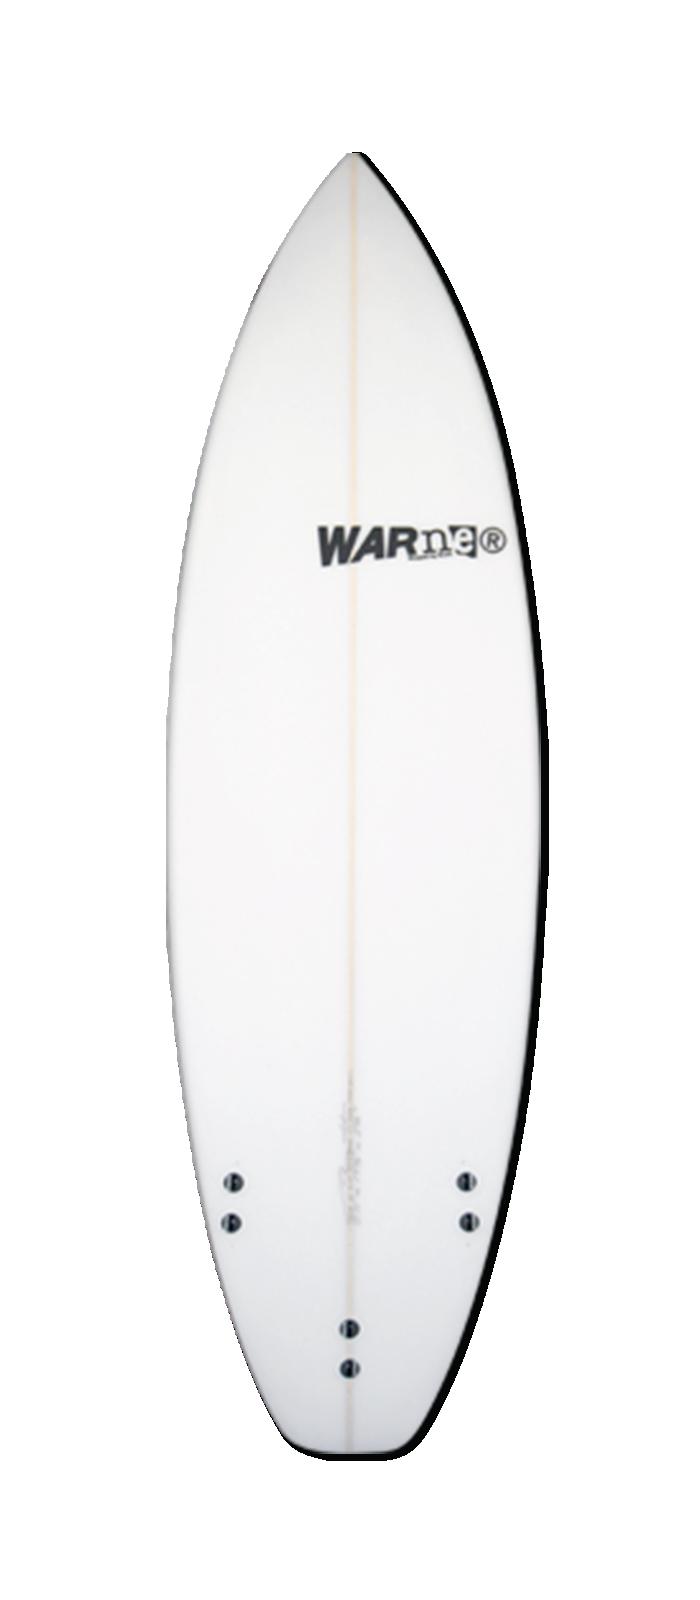 LIL LOVER surfboard model bottom